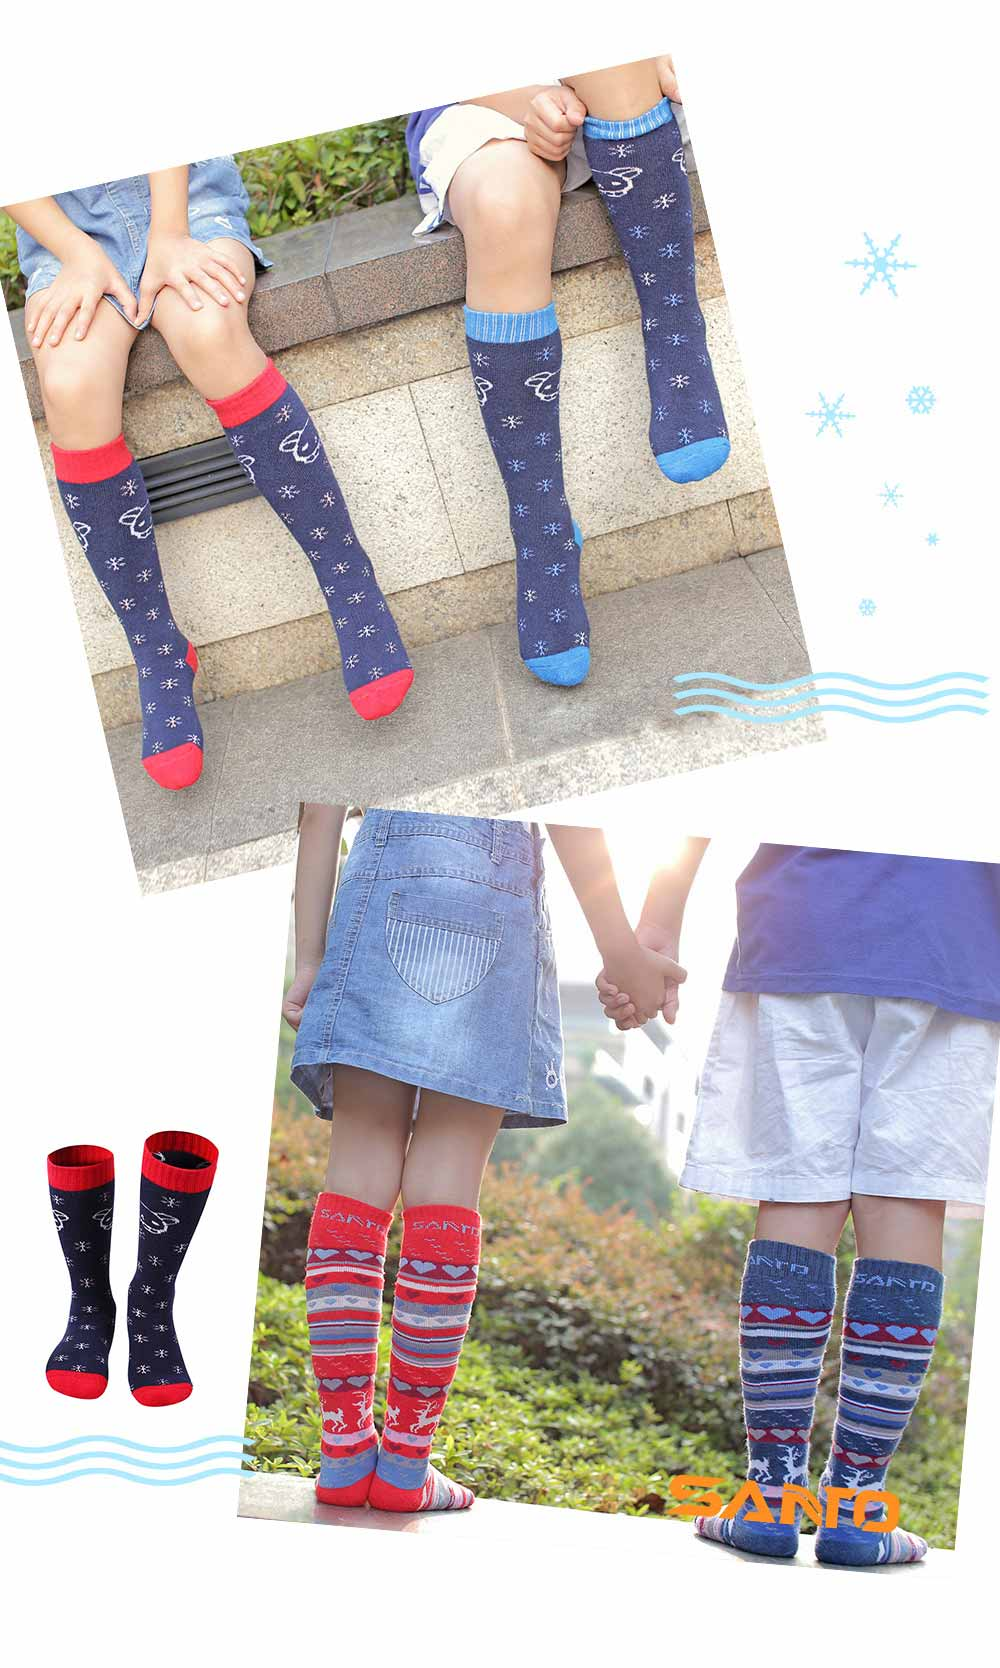 SANTO Ski Socks for Winter Outdoor Activities Thickened Cotton Socks Kids' Lightweight Thermal Socks Odor Resistant Socks 2